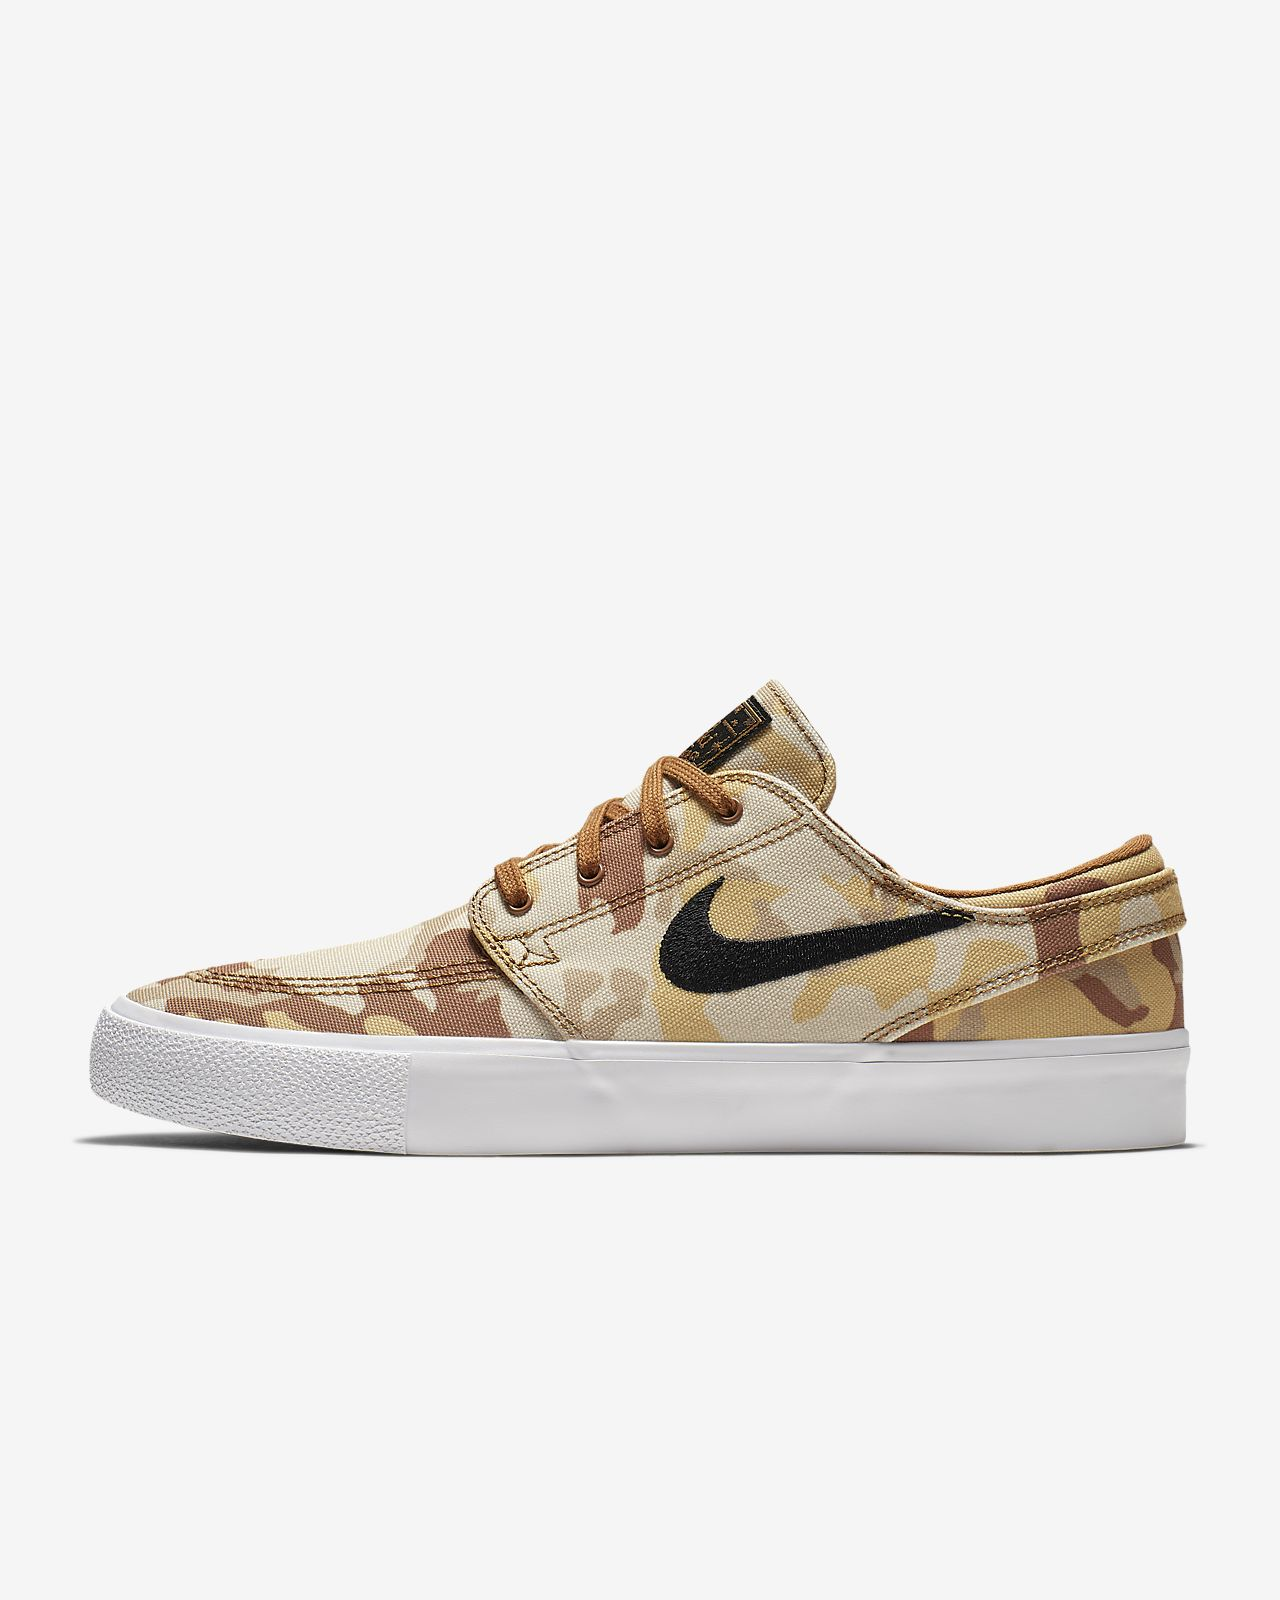 Calzado de skateboarding Nike SB Zoom Stefan Janoski Canvas RM Premium